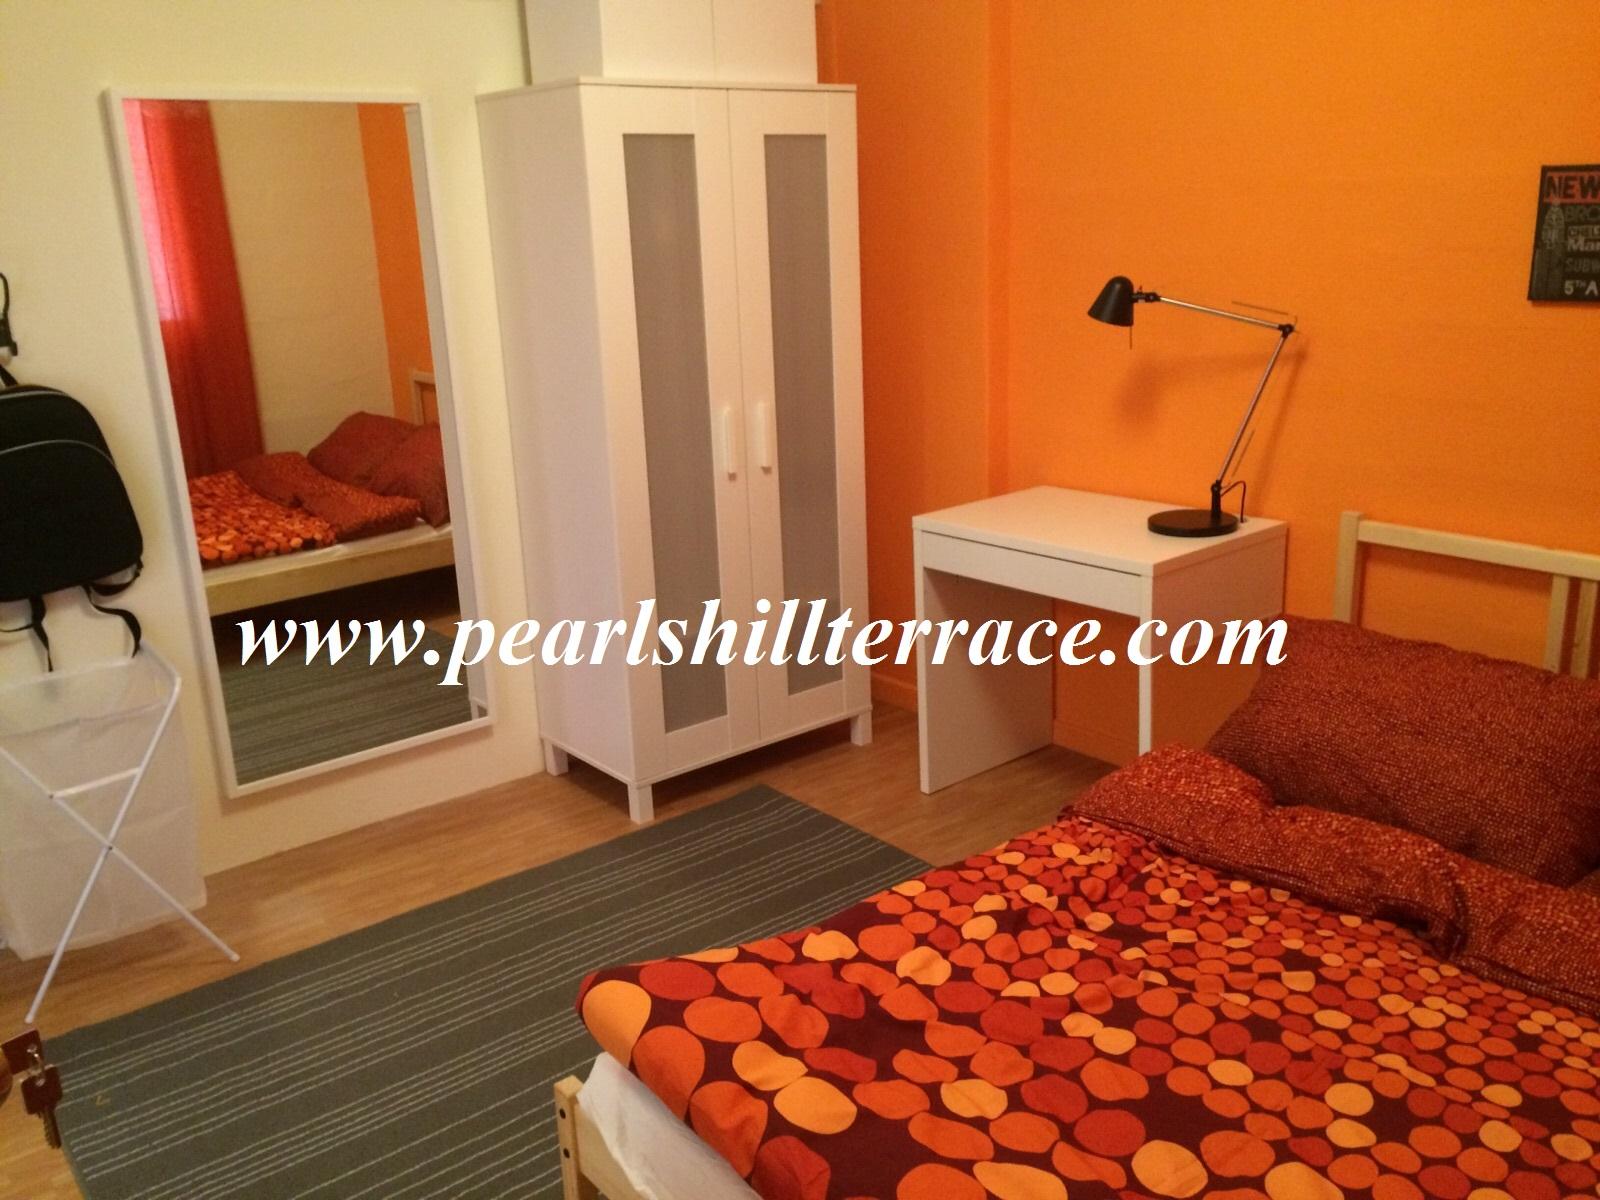 Pearl's Hill Terrace Bedroom